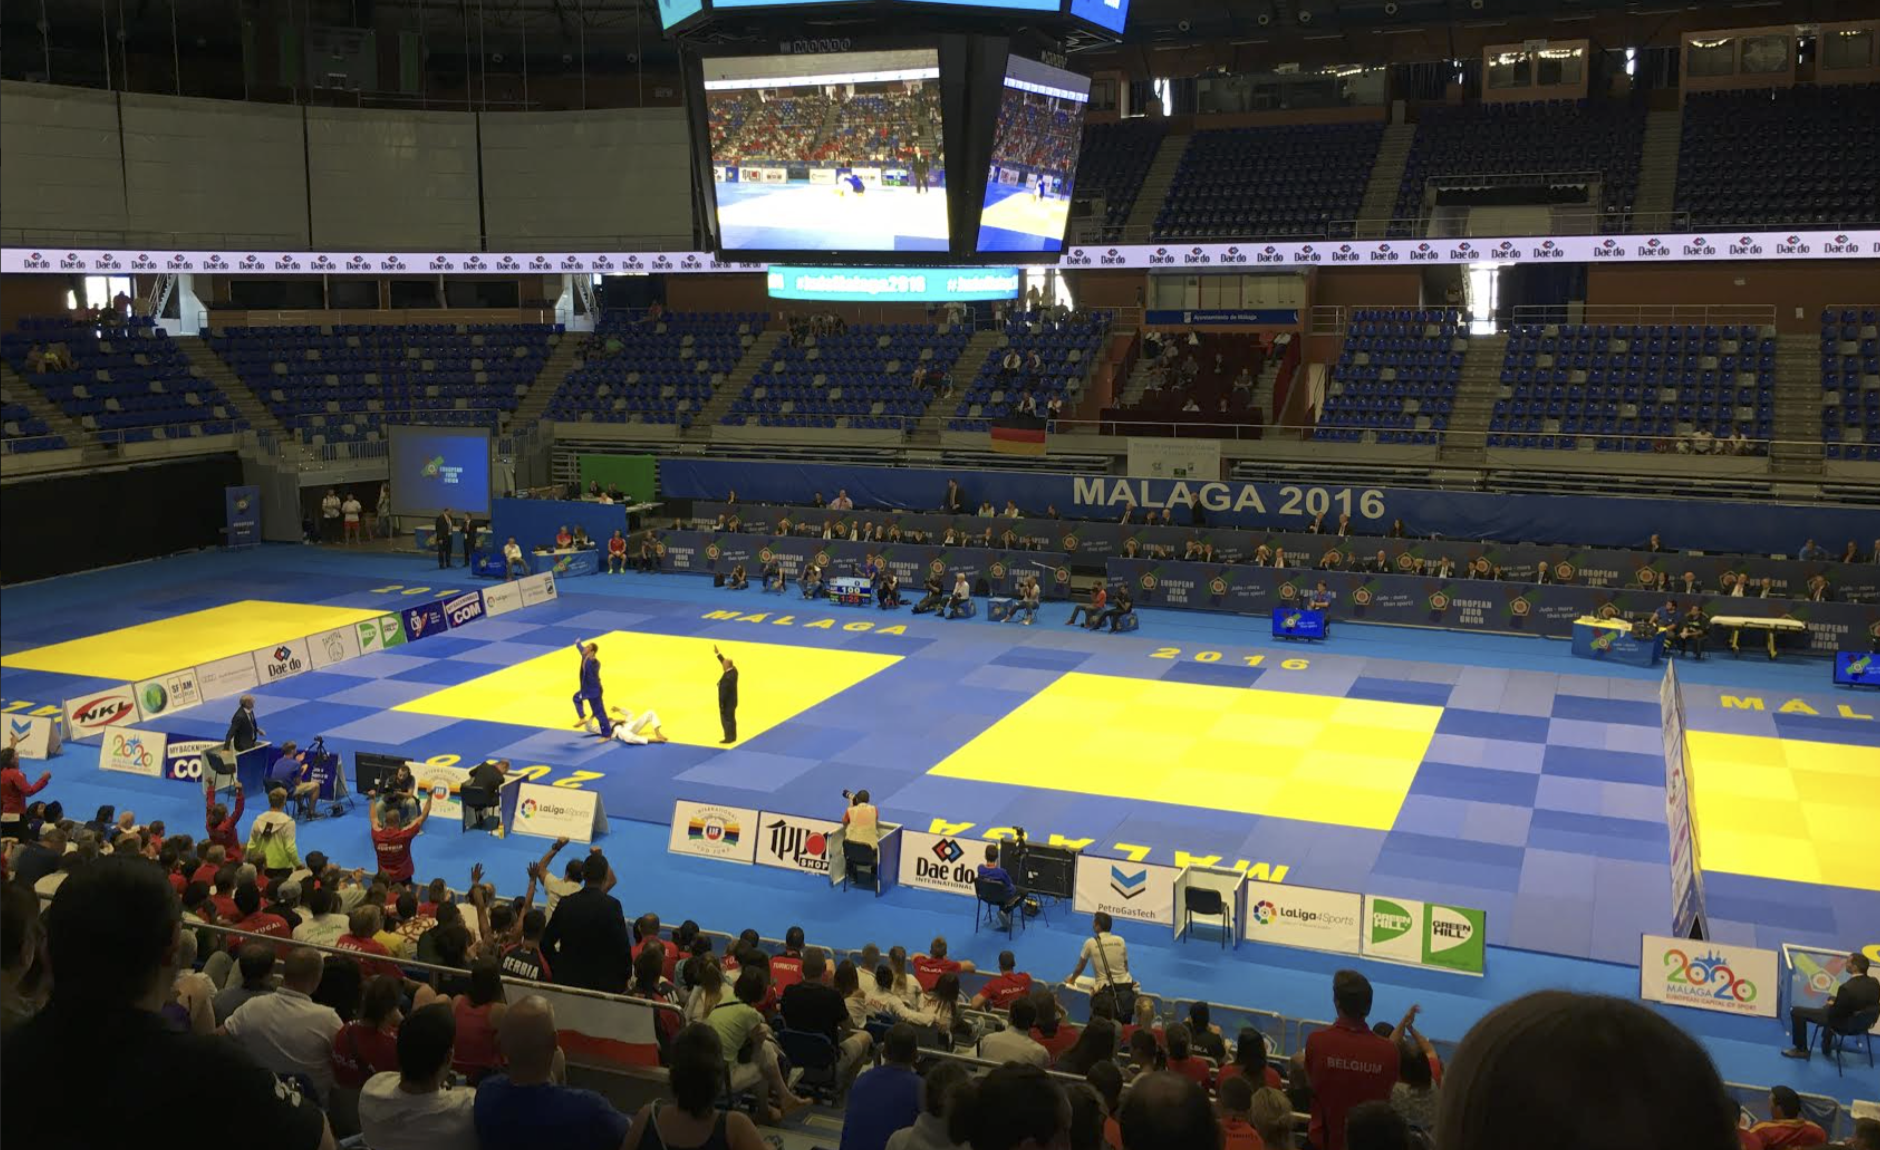 Malaga sport hall